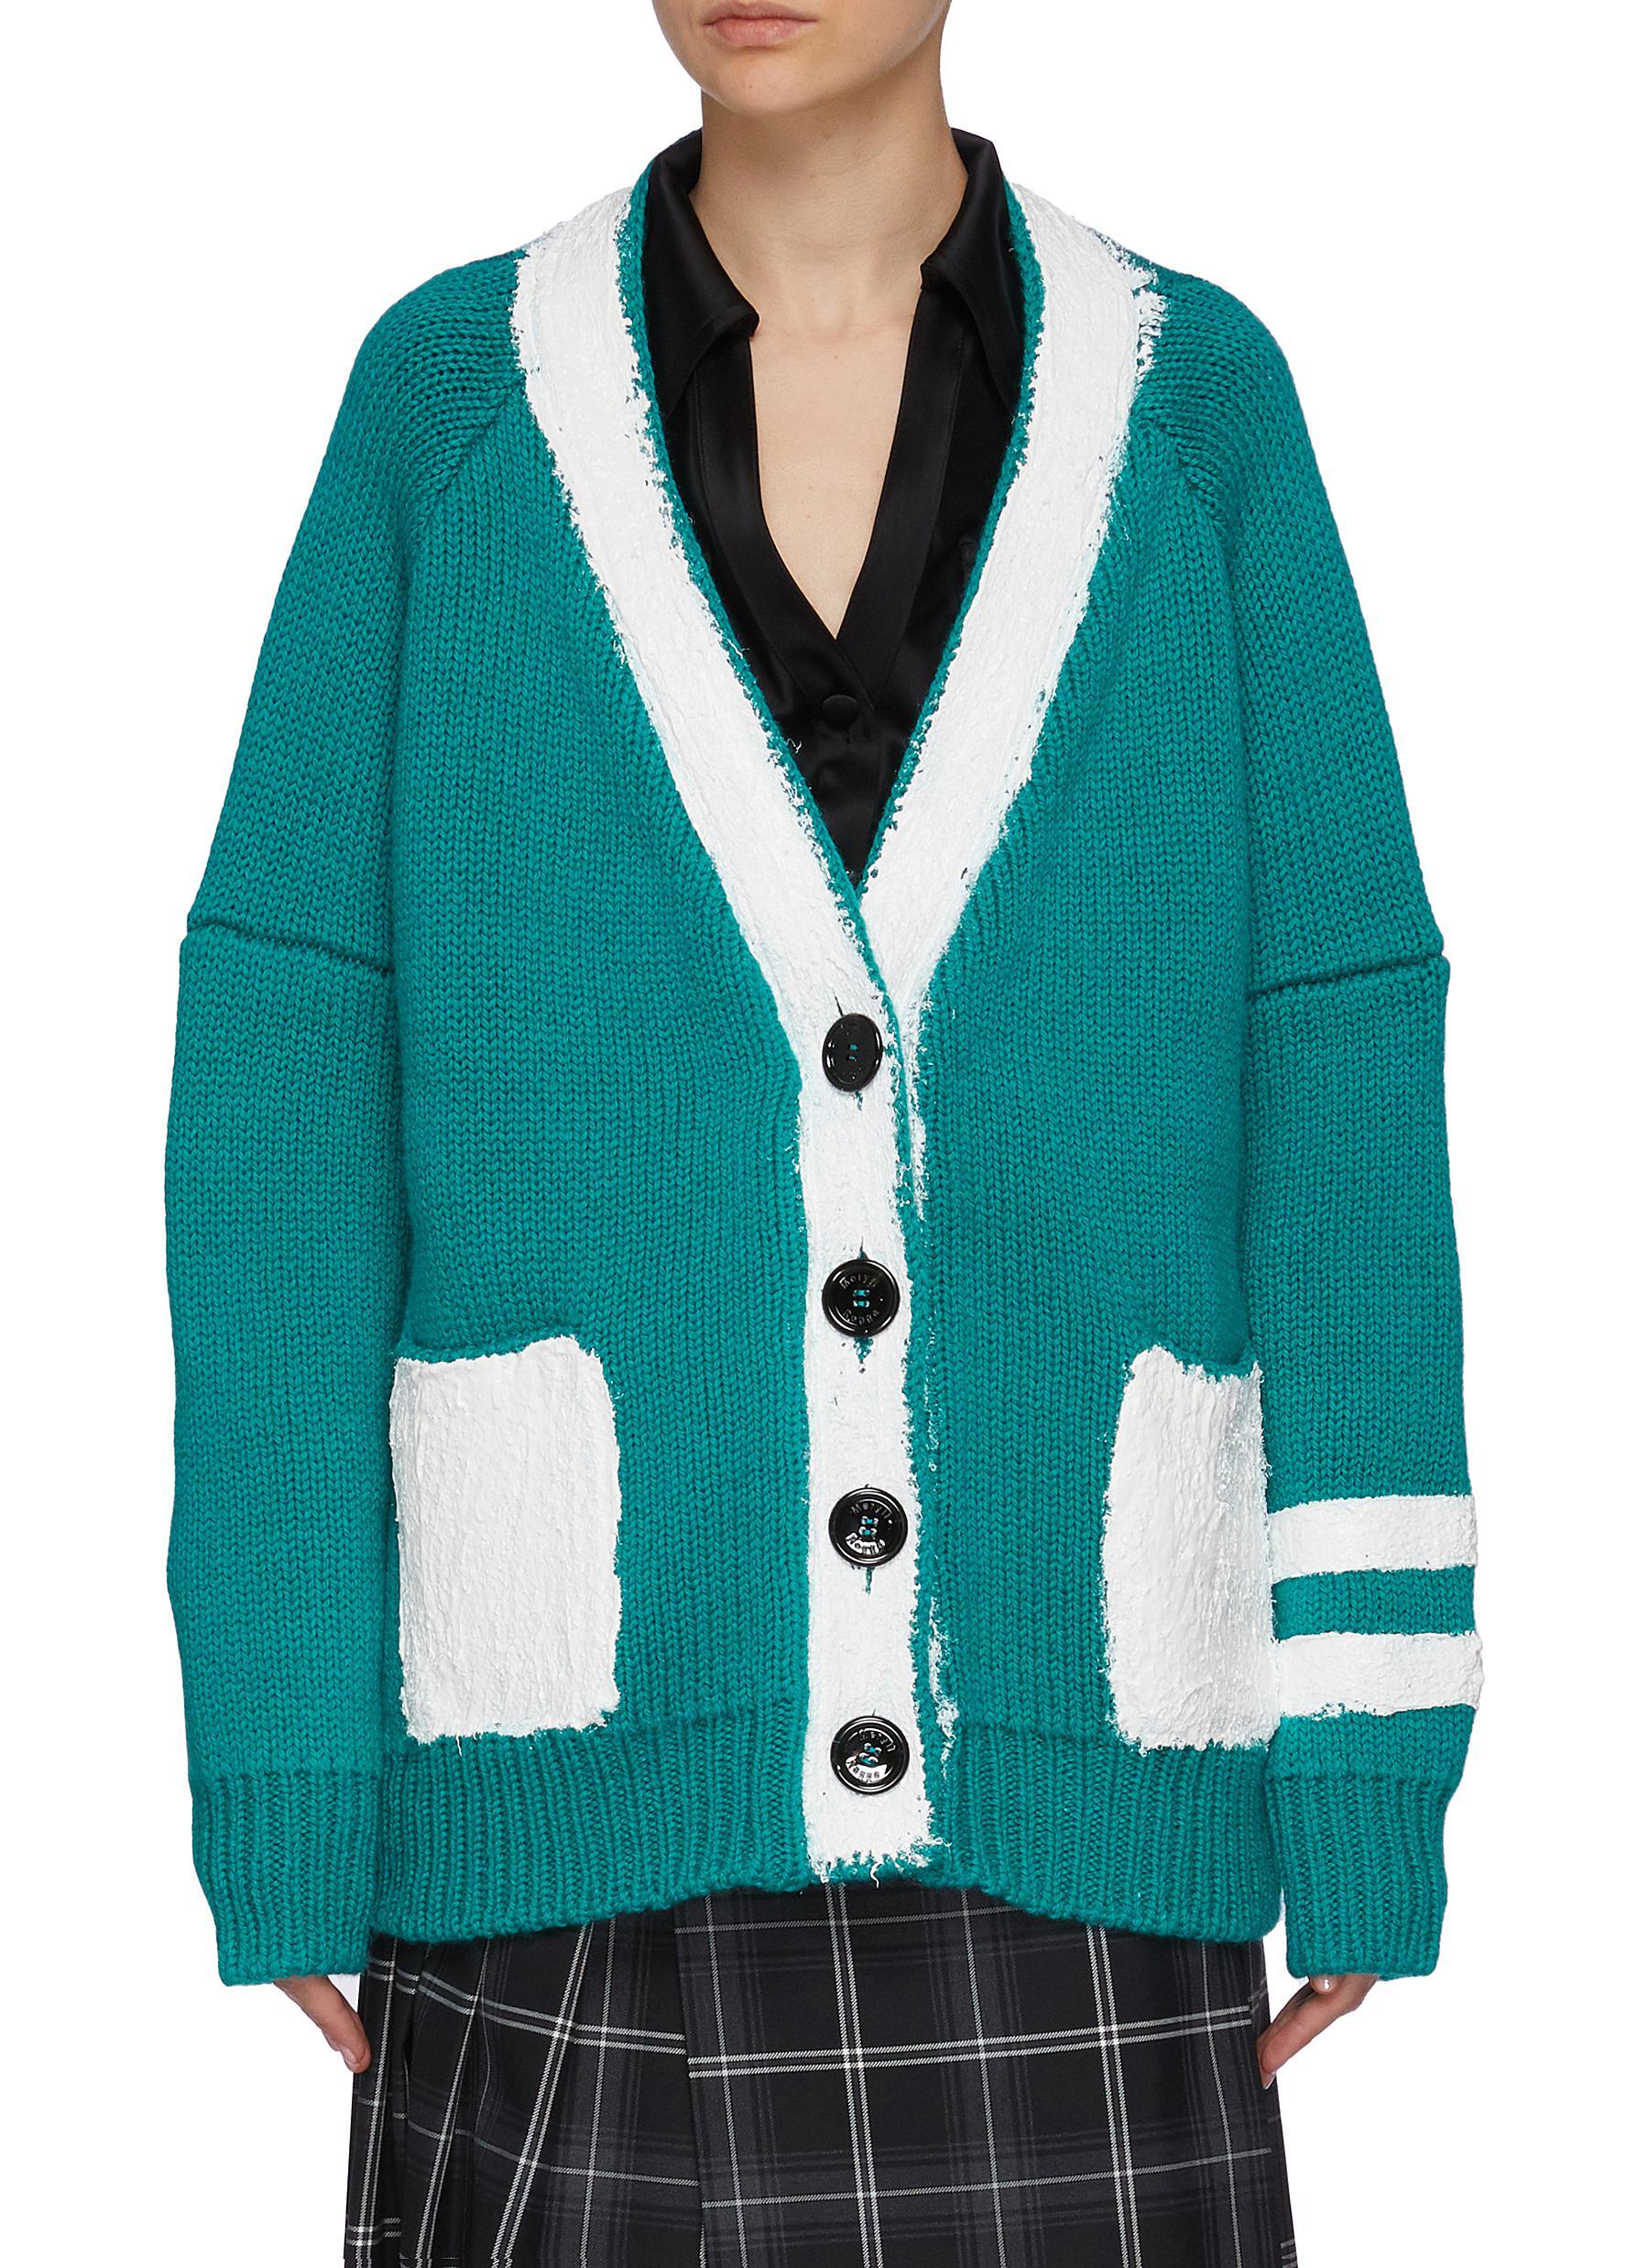 Contrast Paint Stroke Wool Cashmere Blend Cardigan